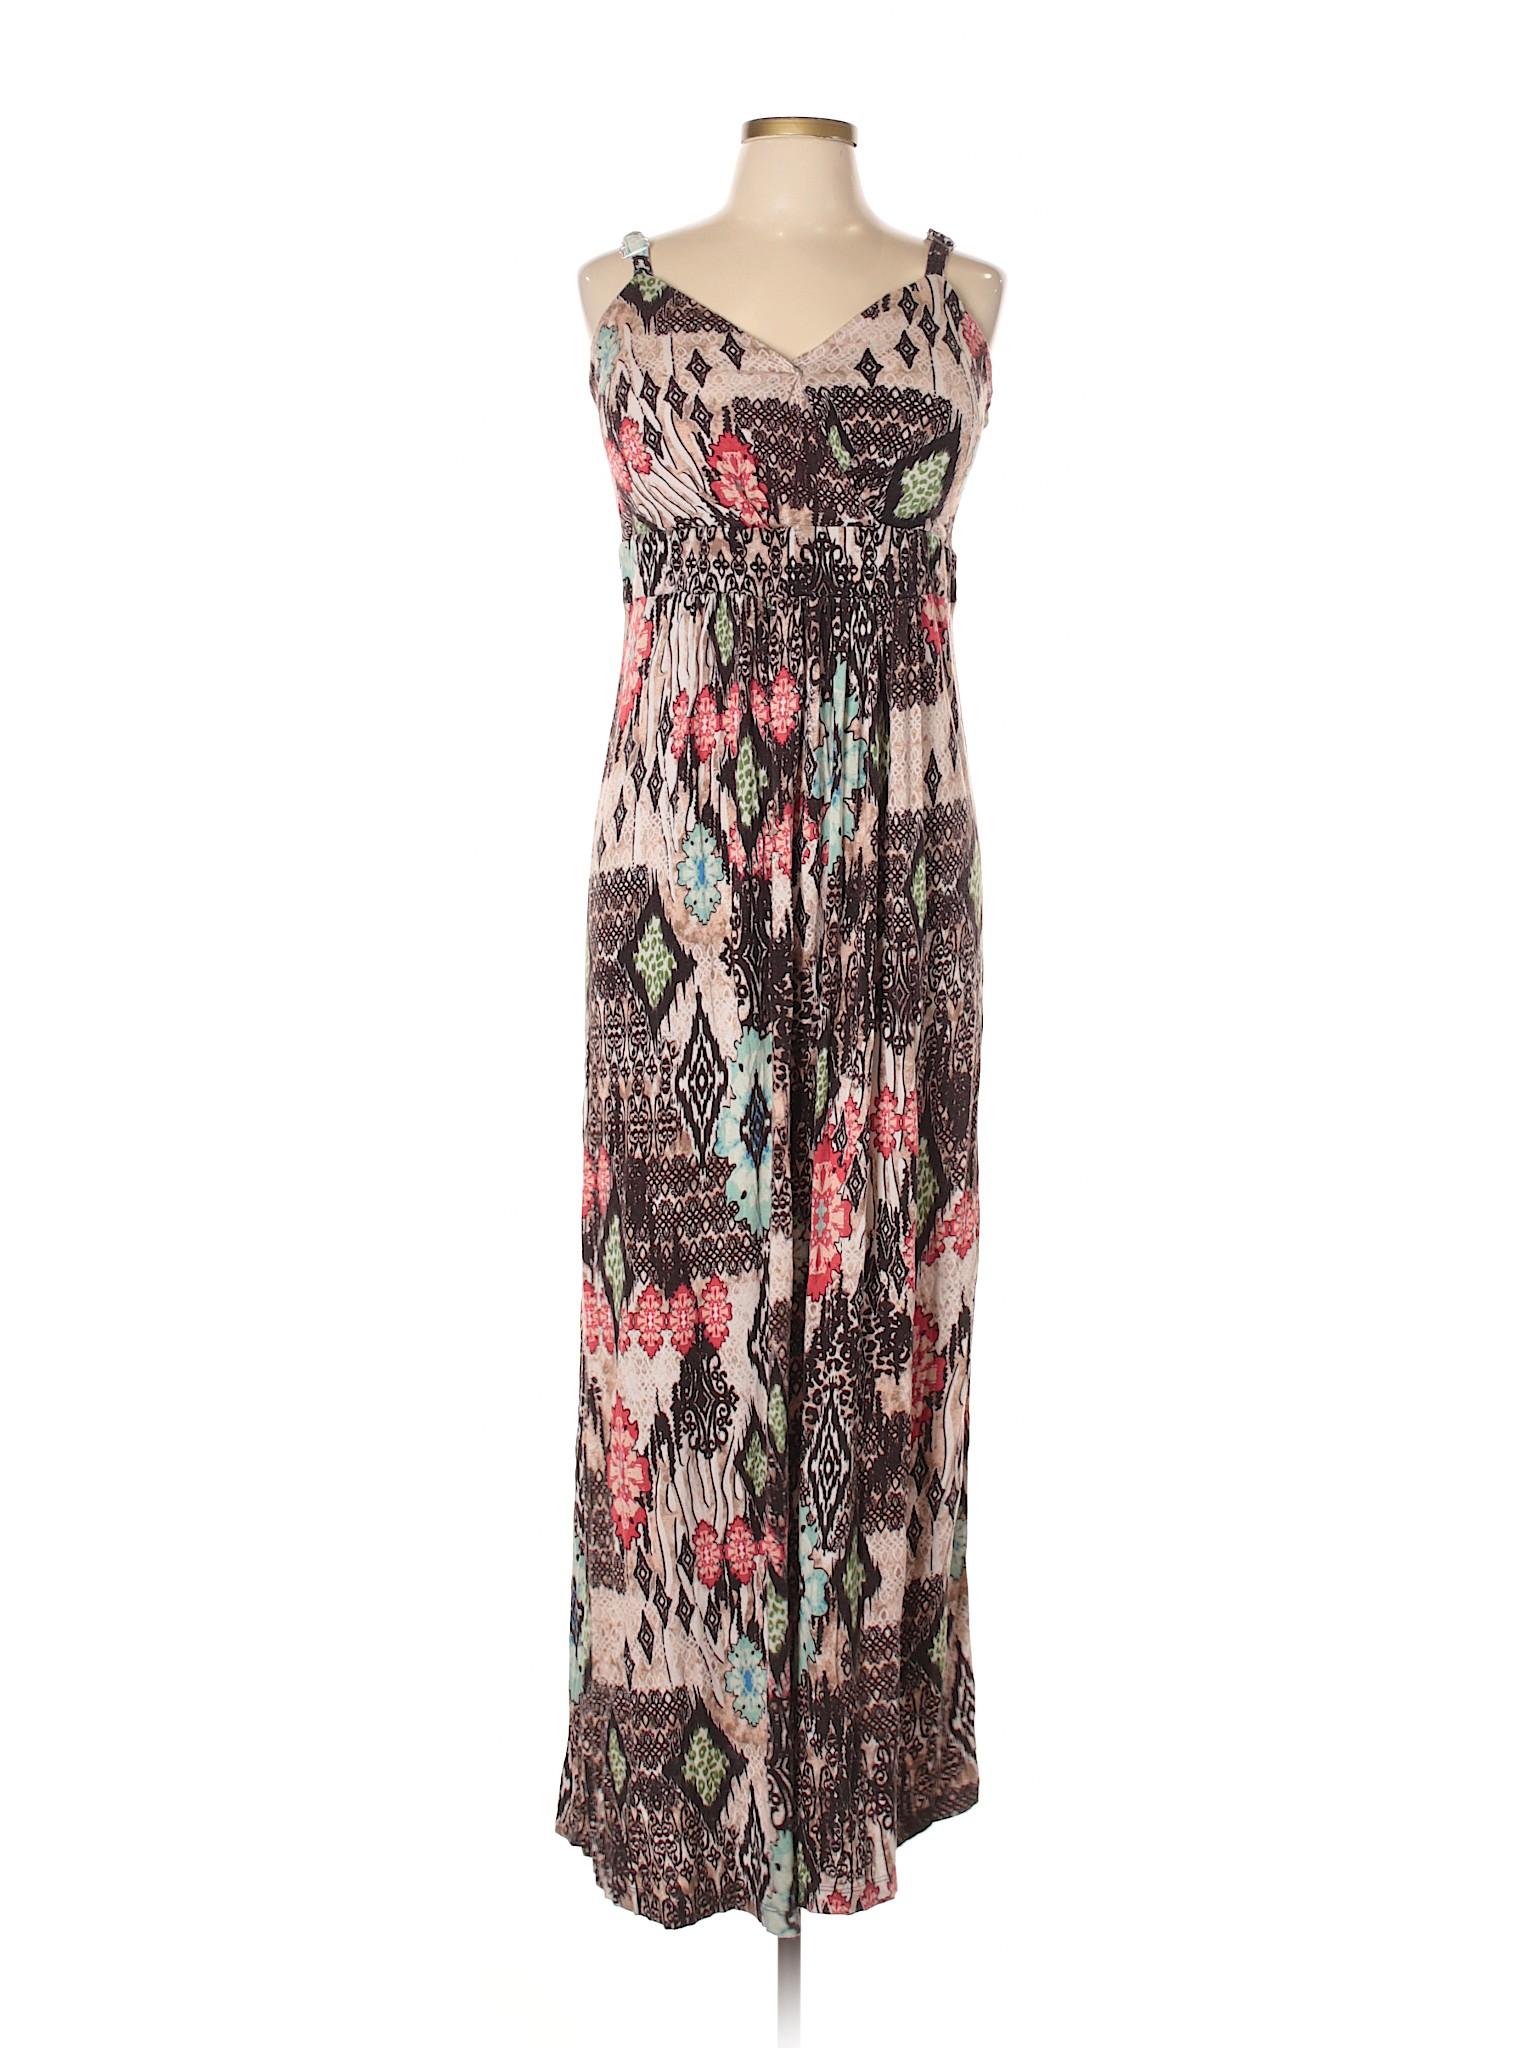 Boutique Cie Casual Rag Dress winter American x8C0qPwU